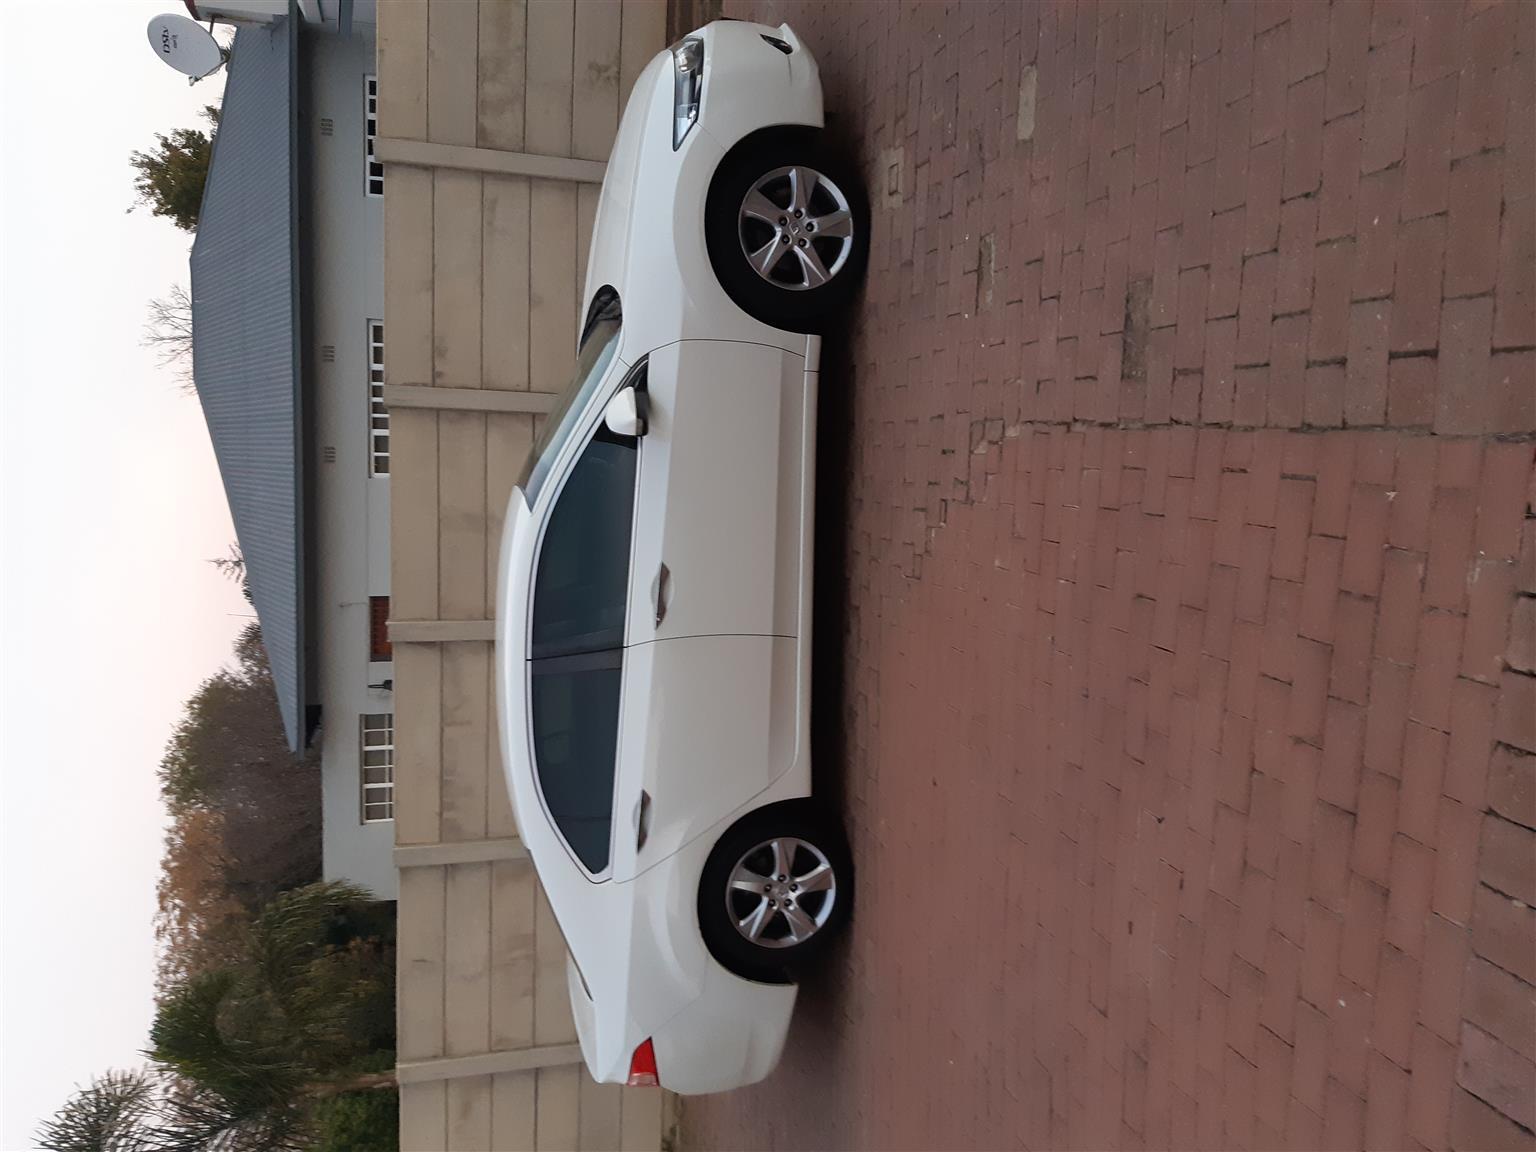 2012 Honda Accord 2.0 Executive automatic